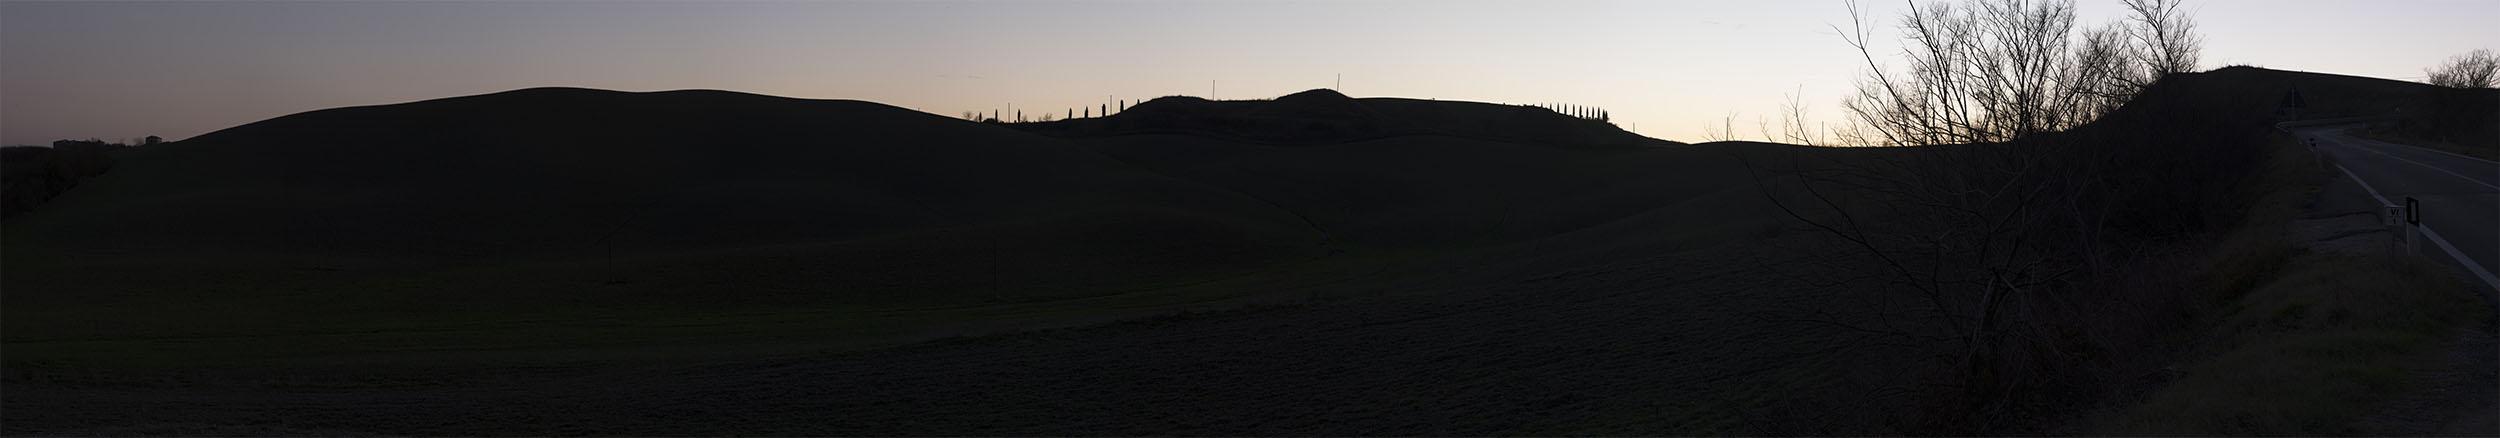 TwiLight,Siena to Asciano,1-4-2015,7622-7632